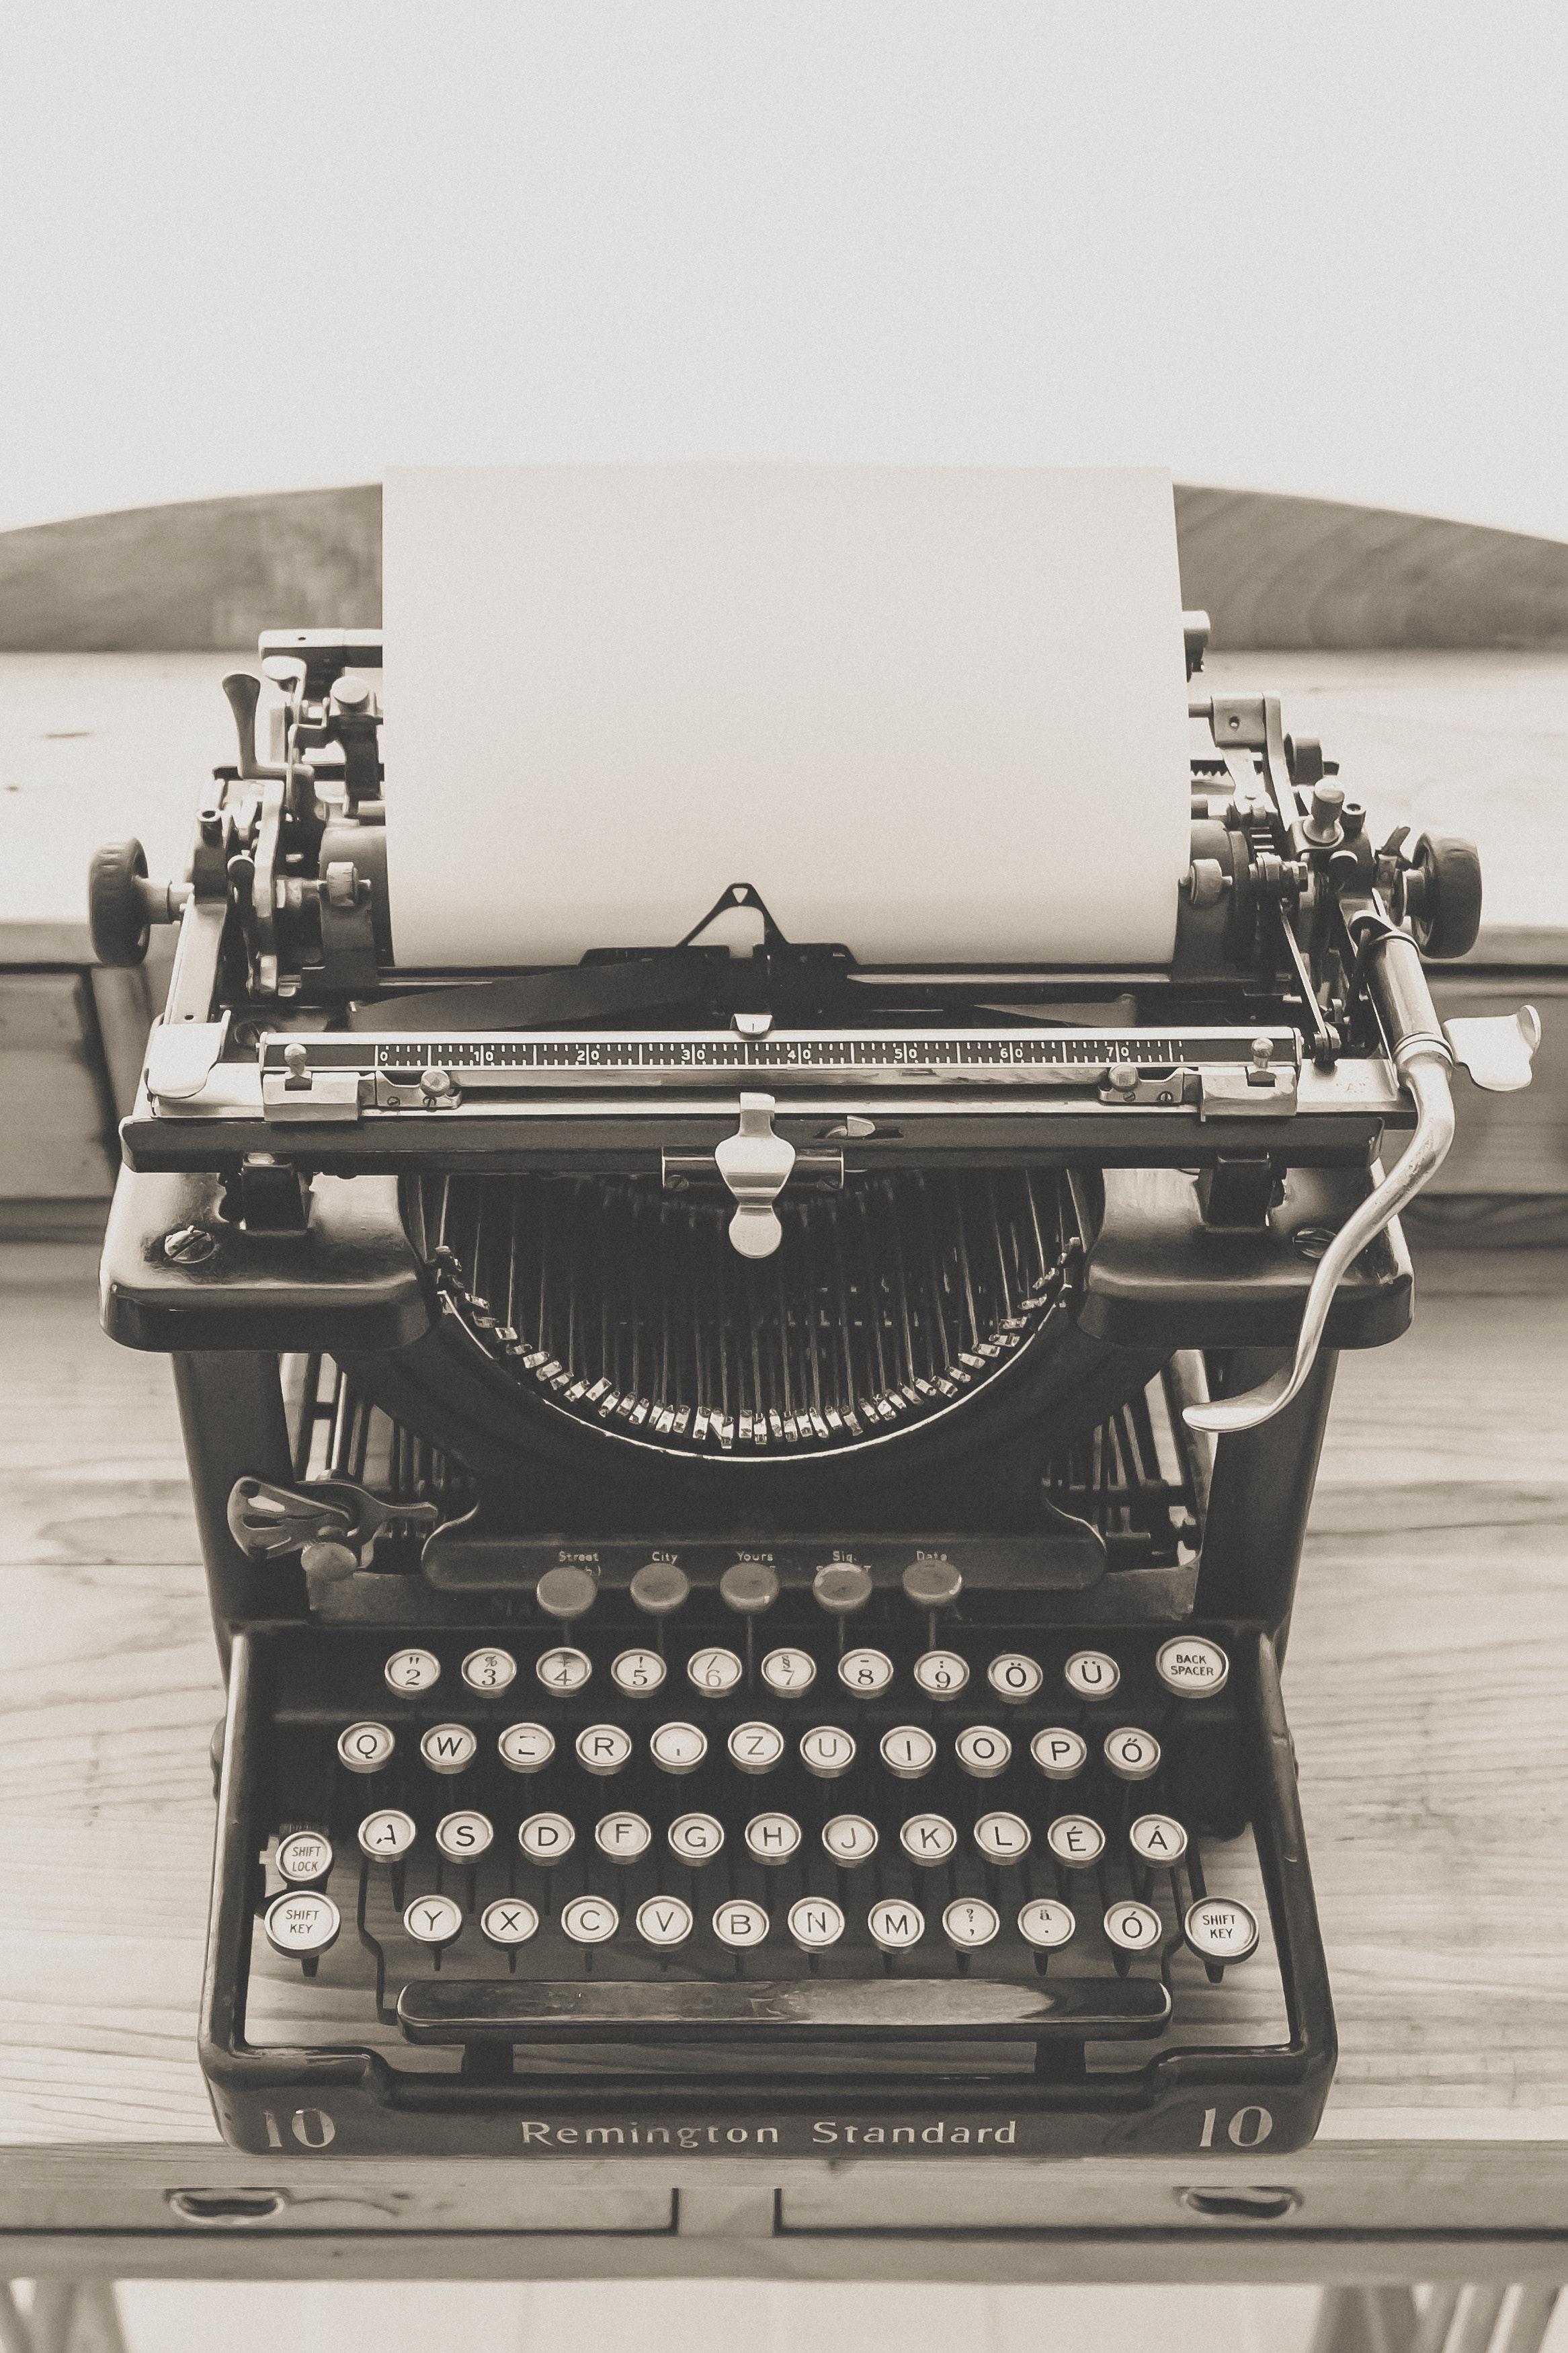 Black Vintage Typewriter, Technology, Retro, Paper, Type, HQ Photo